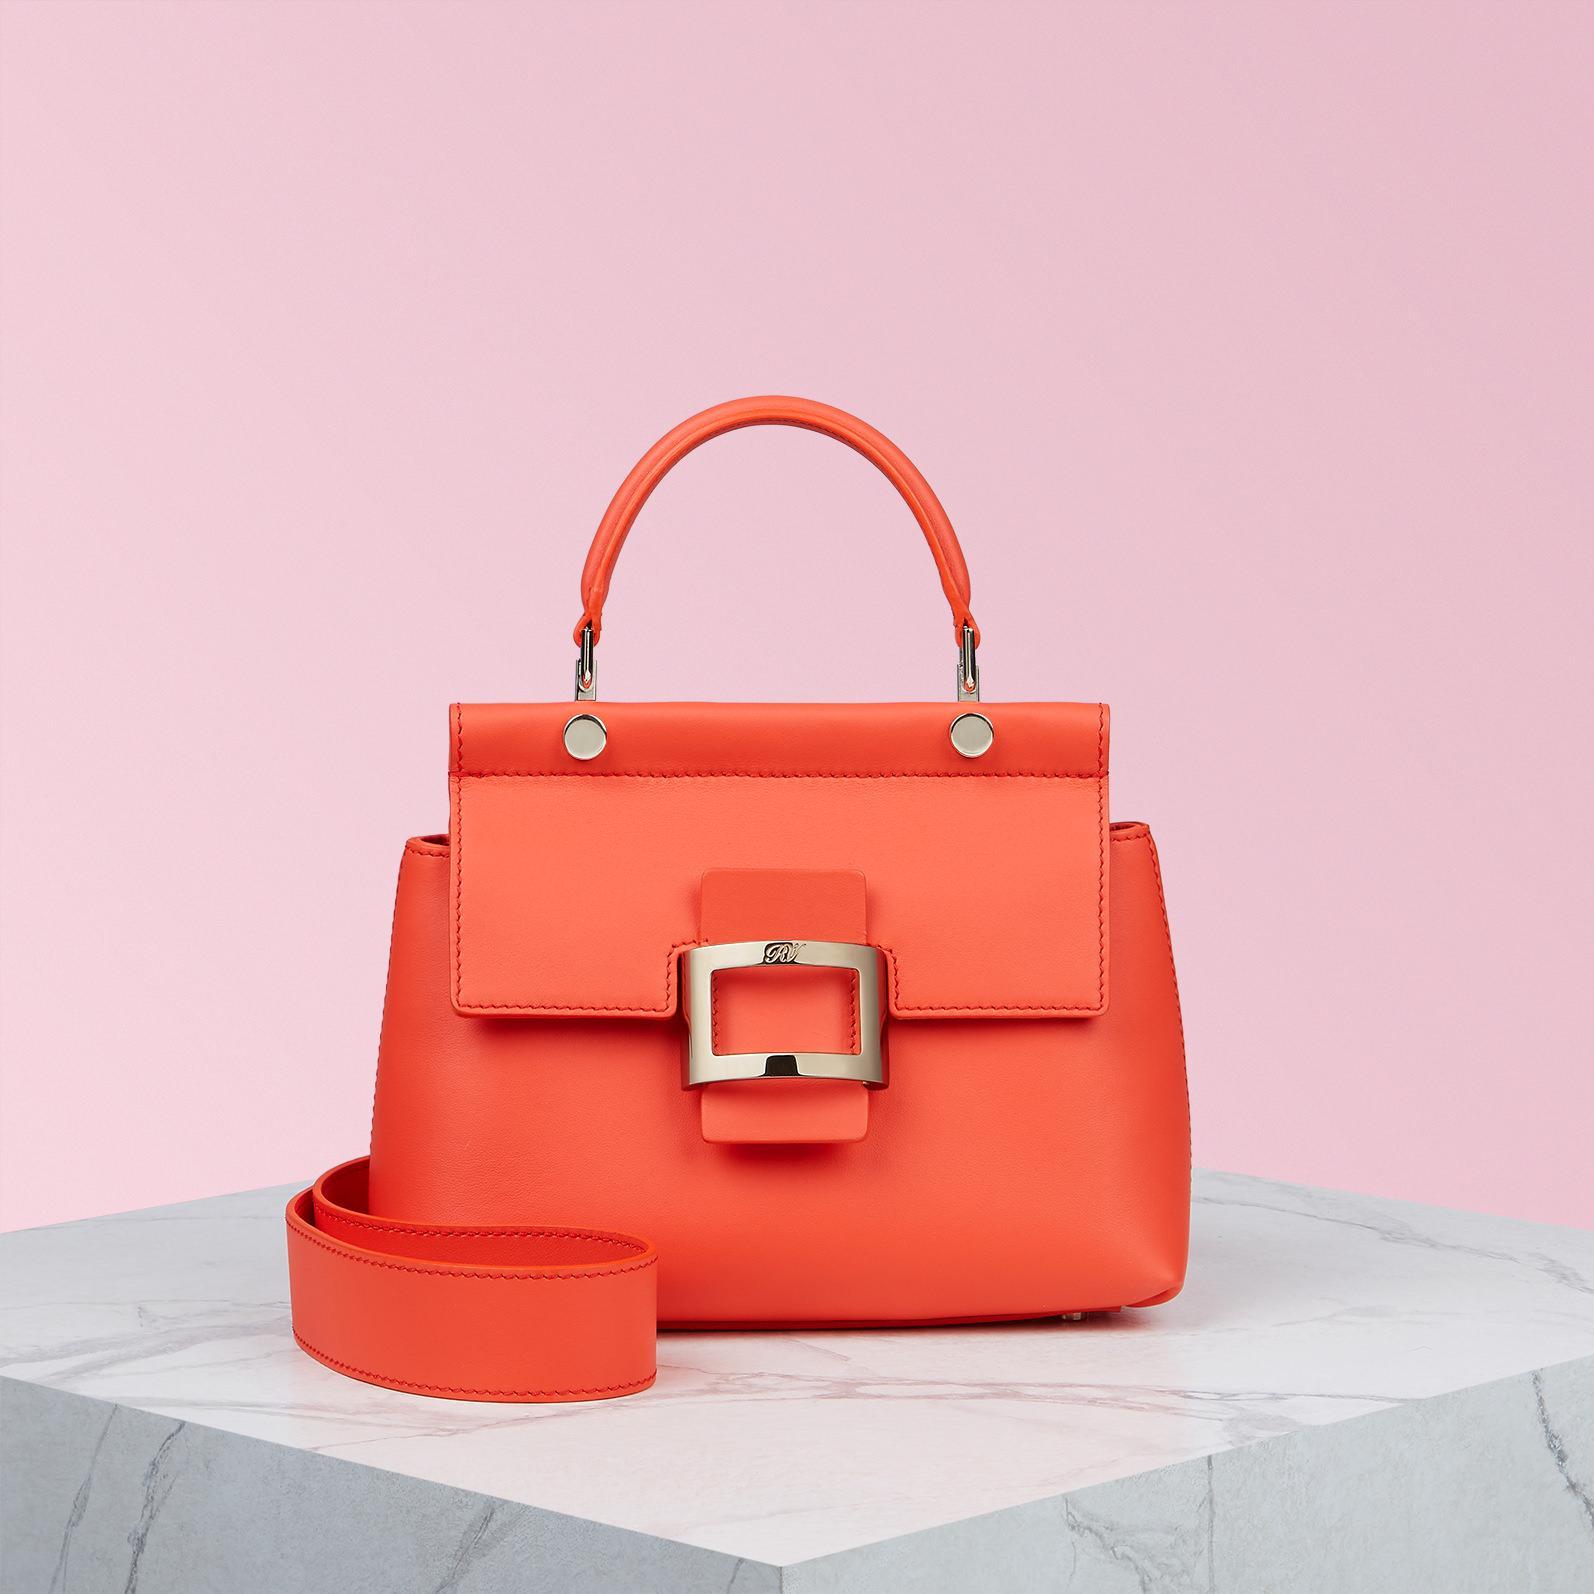 34d1a7841921 Lyst - Roger Vivier Viv  Cabas Mini In Leather in Orange